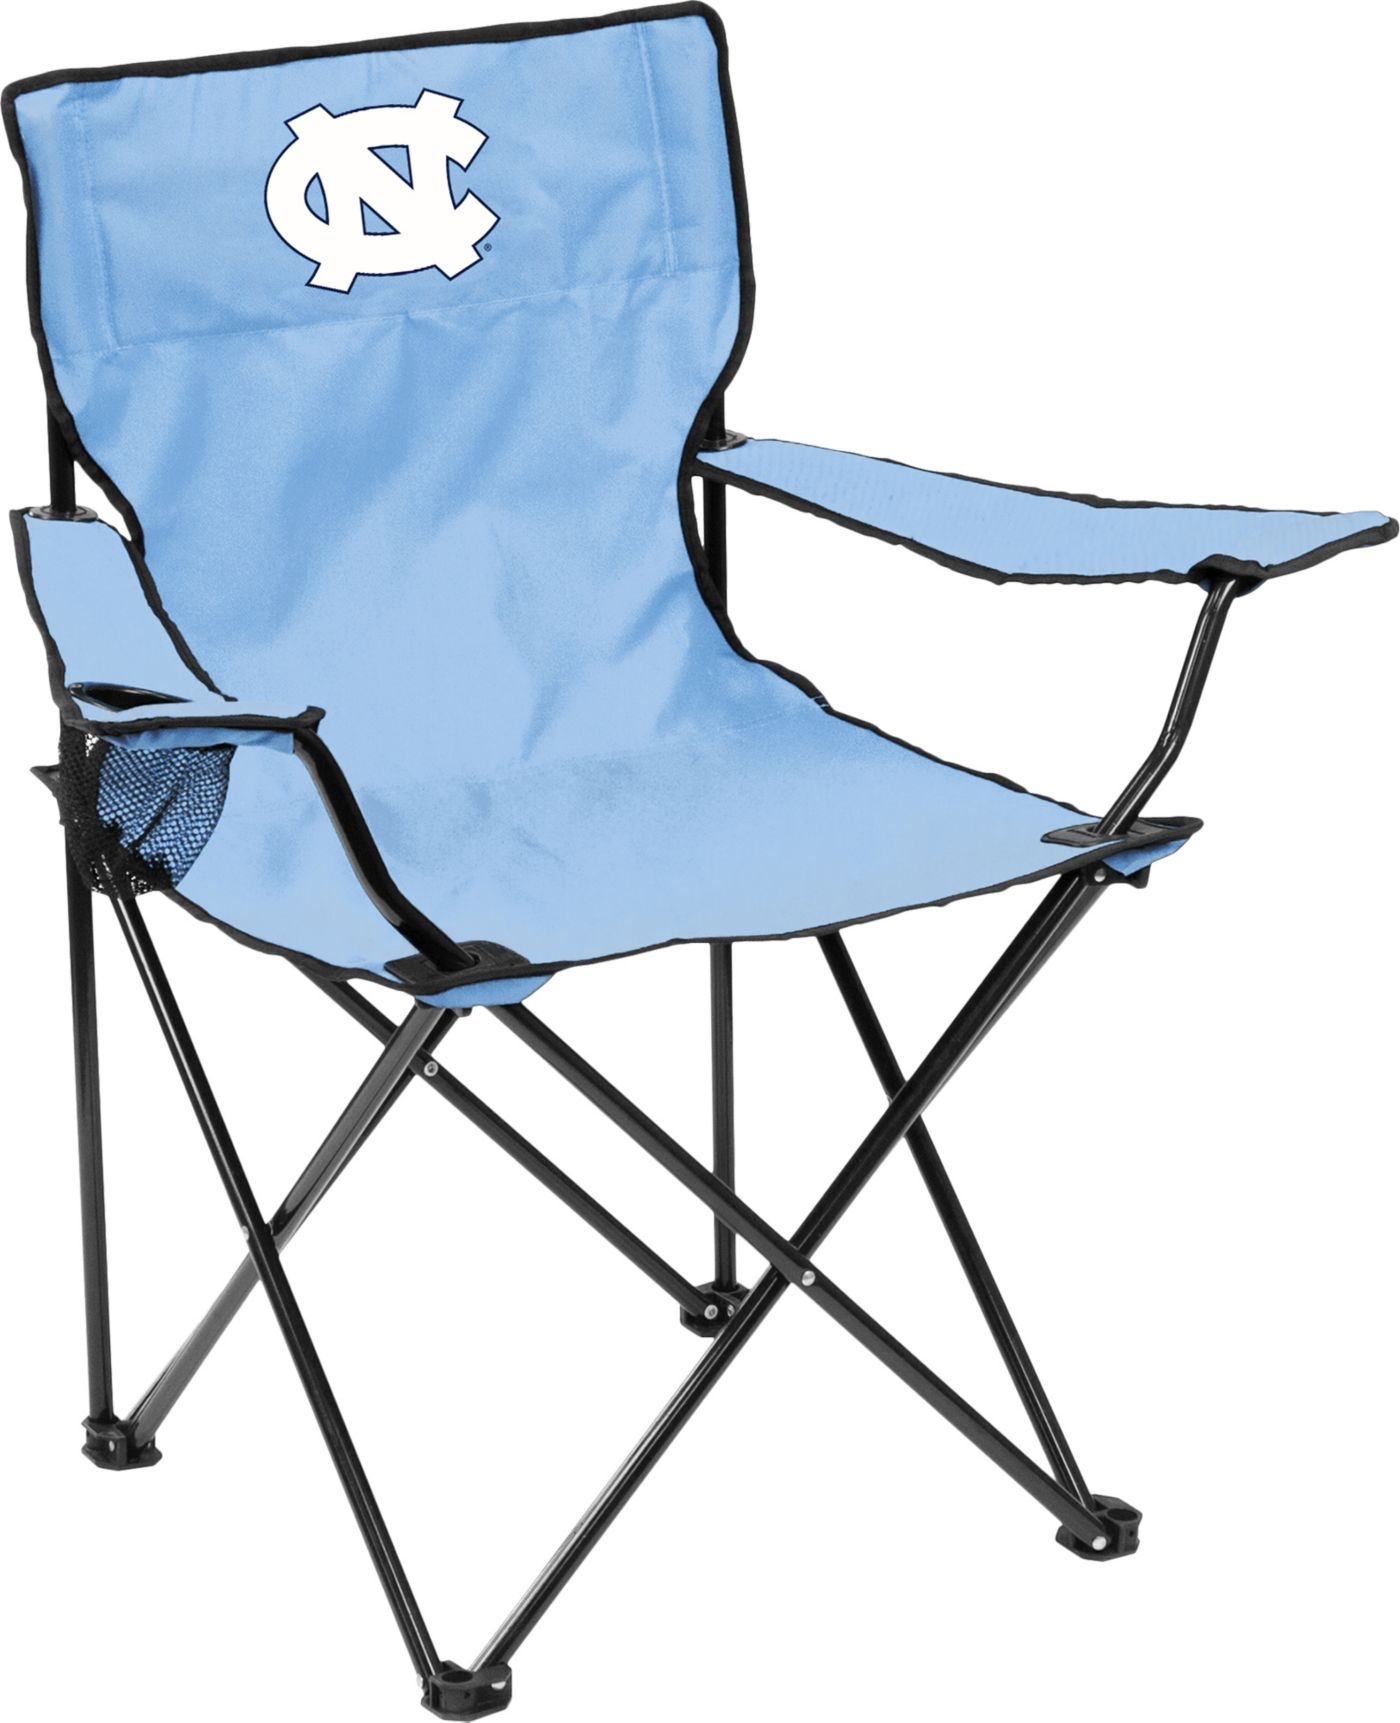 North Carolina Tar Heels Team-Colored Canvas Chair